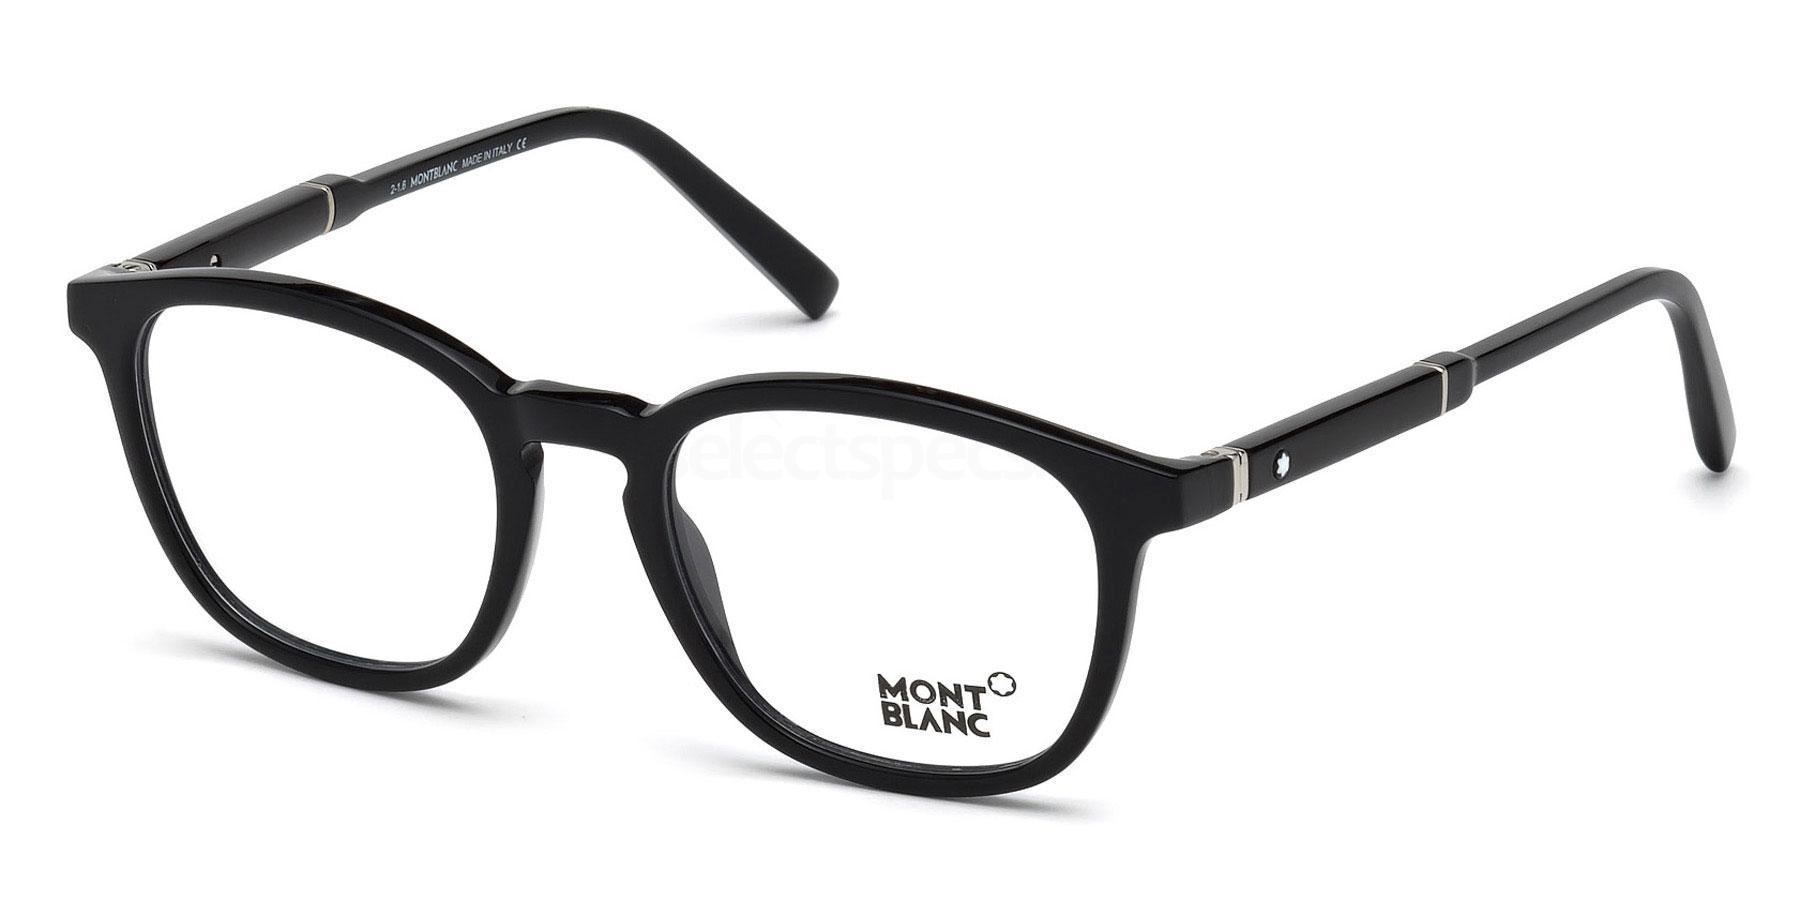 001 MB0639 Glasses, Mont Blanc